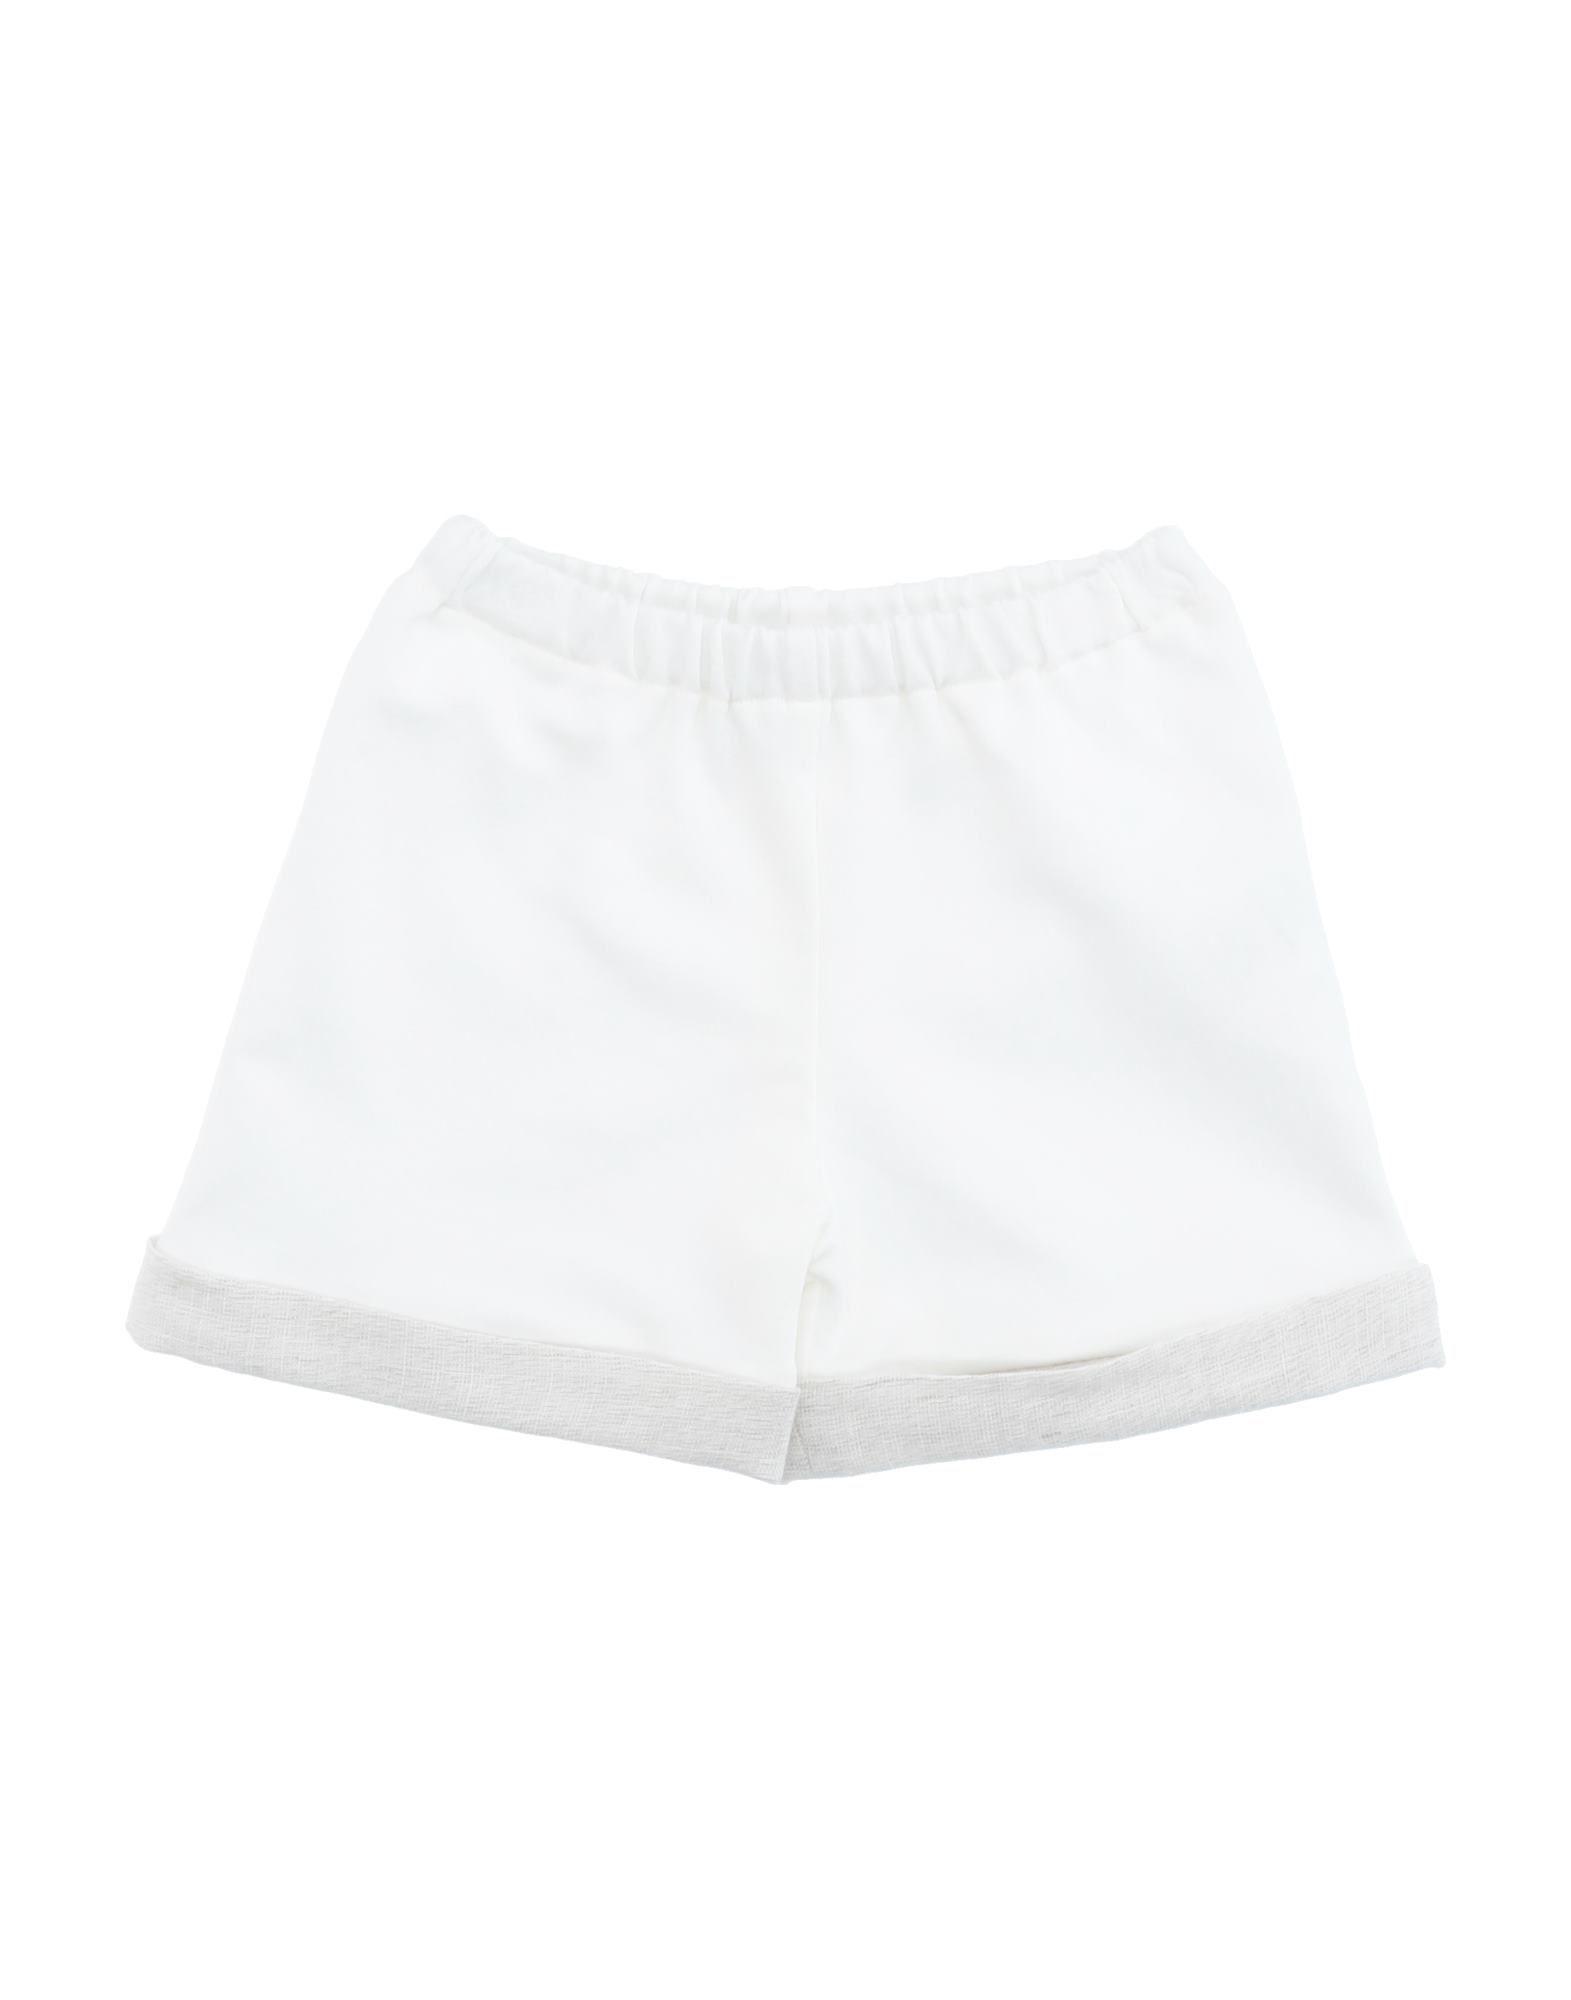 Filobio Kids' Bermudas In White